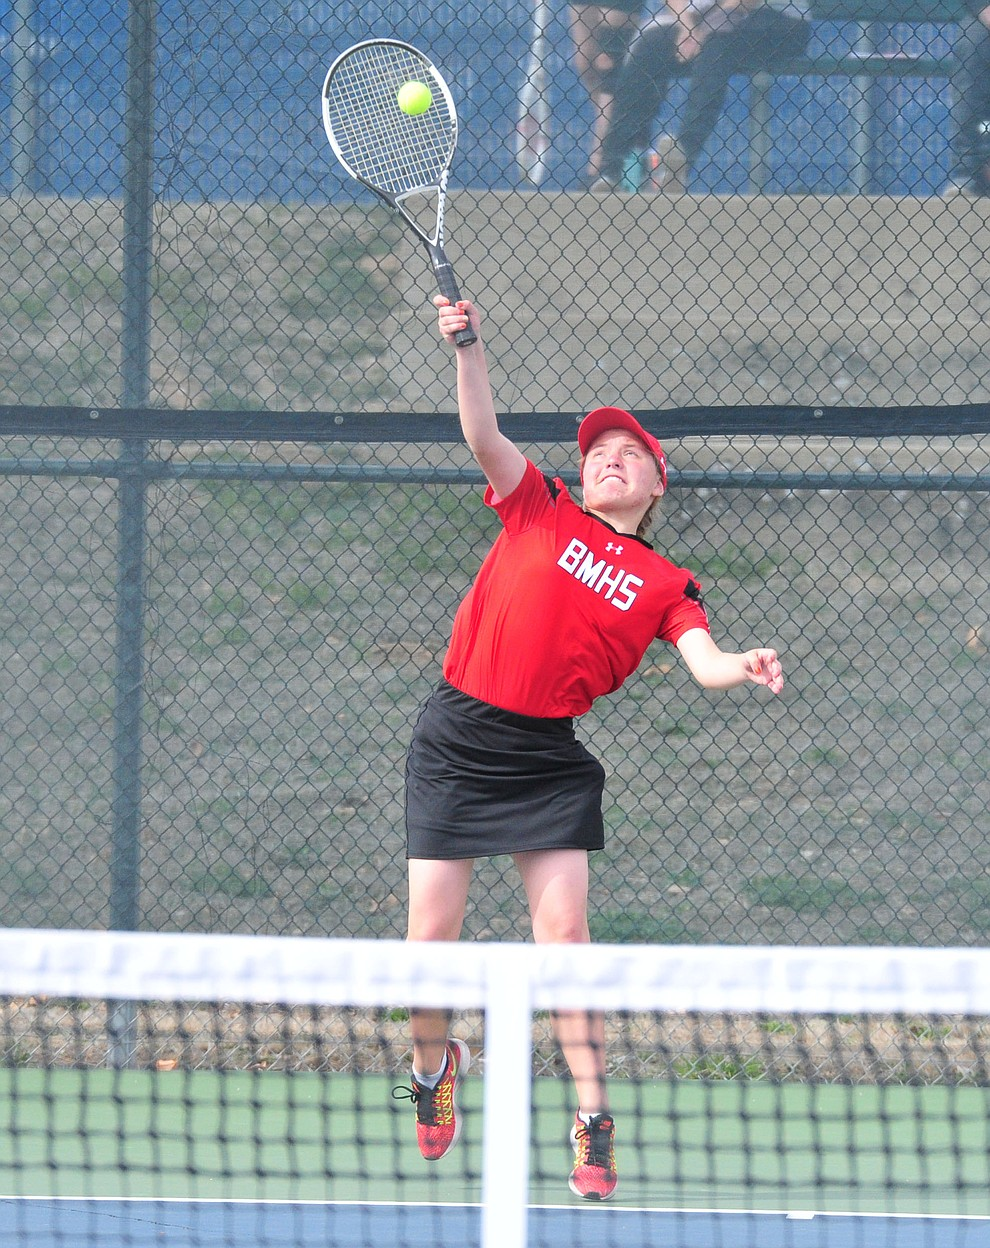 Bradshaw Mountain's Rachel Supergan serves as the Bears traveled to Prescott for a girls tennis matchup Tuesday, March 26. (Les Stukenberg/Courier)